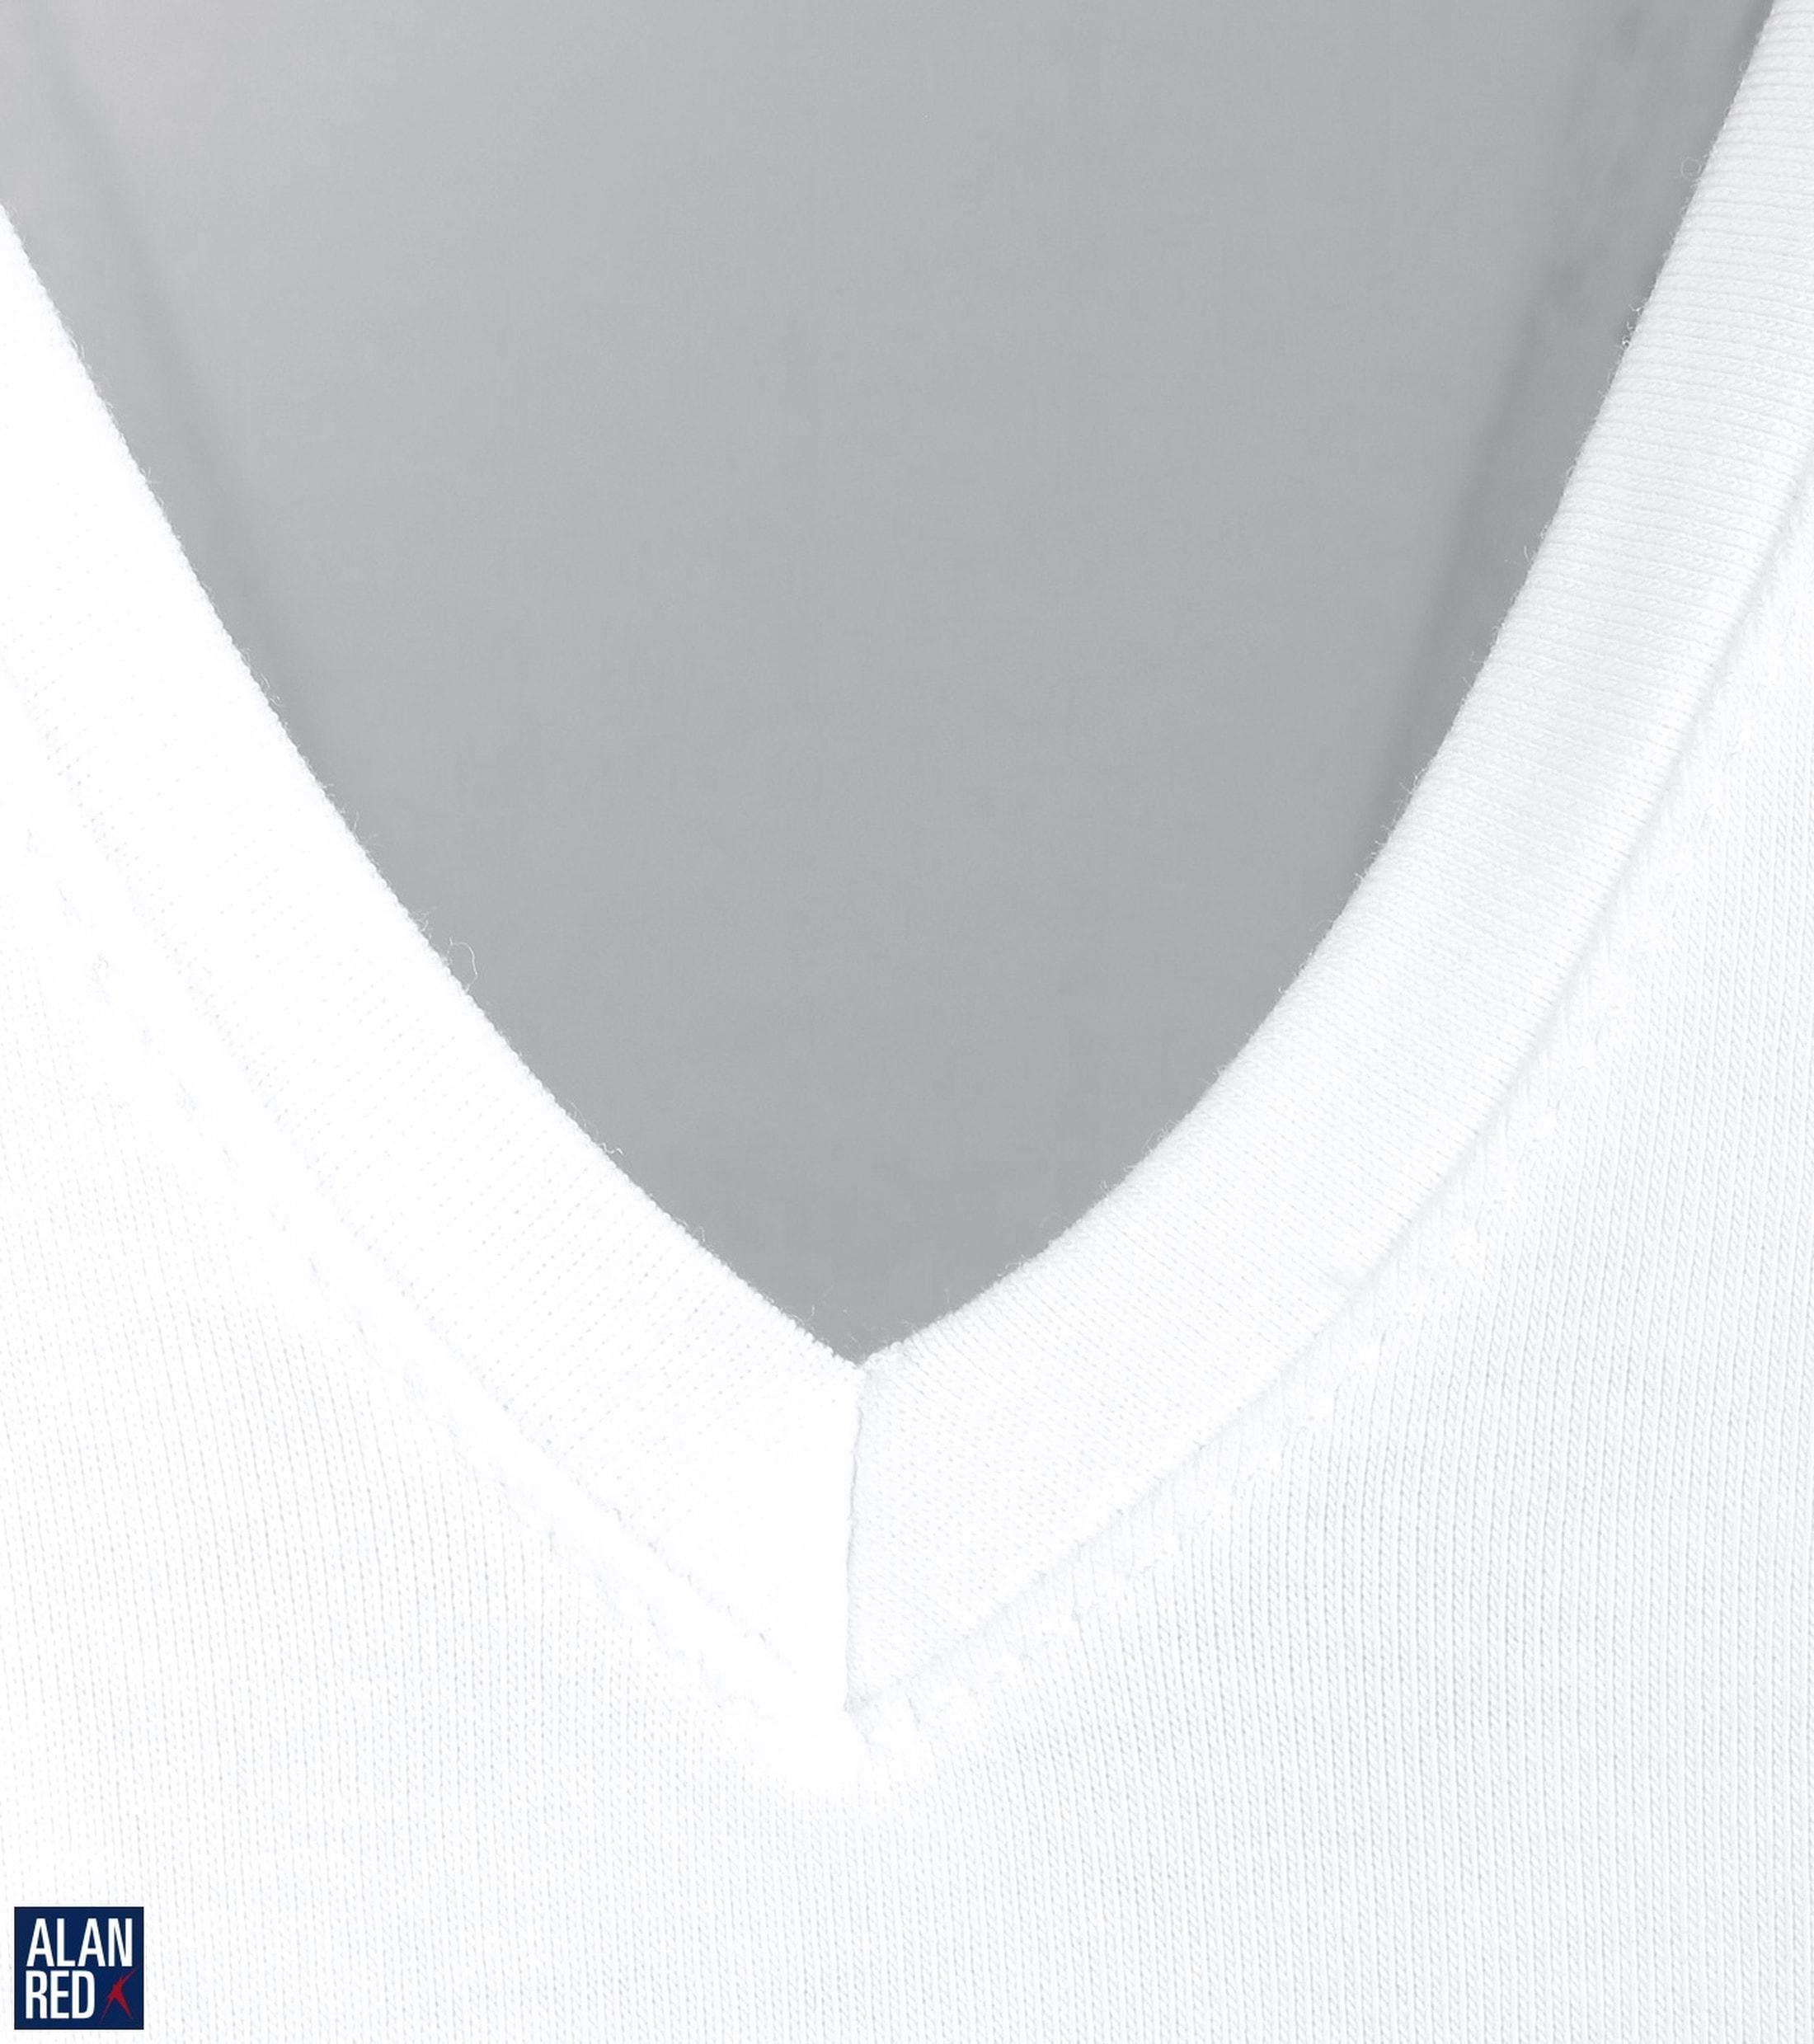 Alan Red T-shirt Deep V-Neck White 2-Pack foto 1